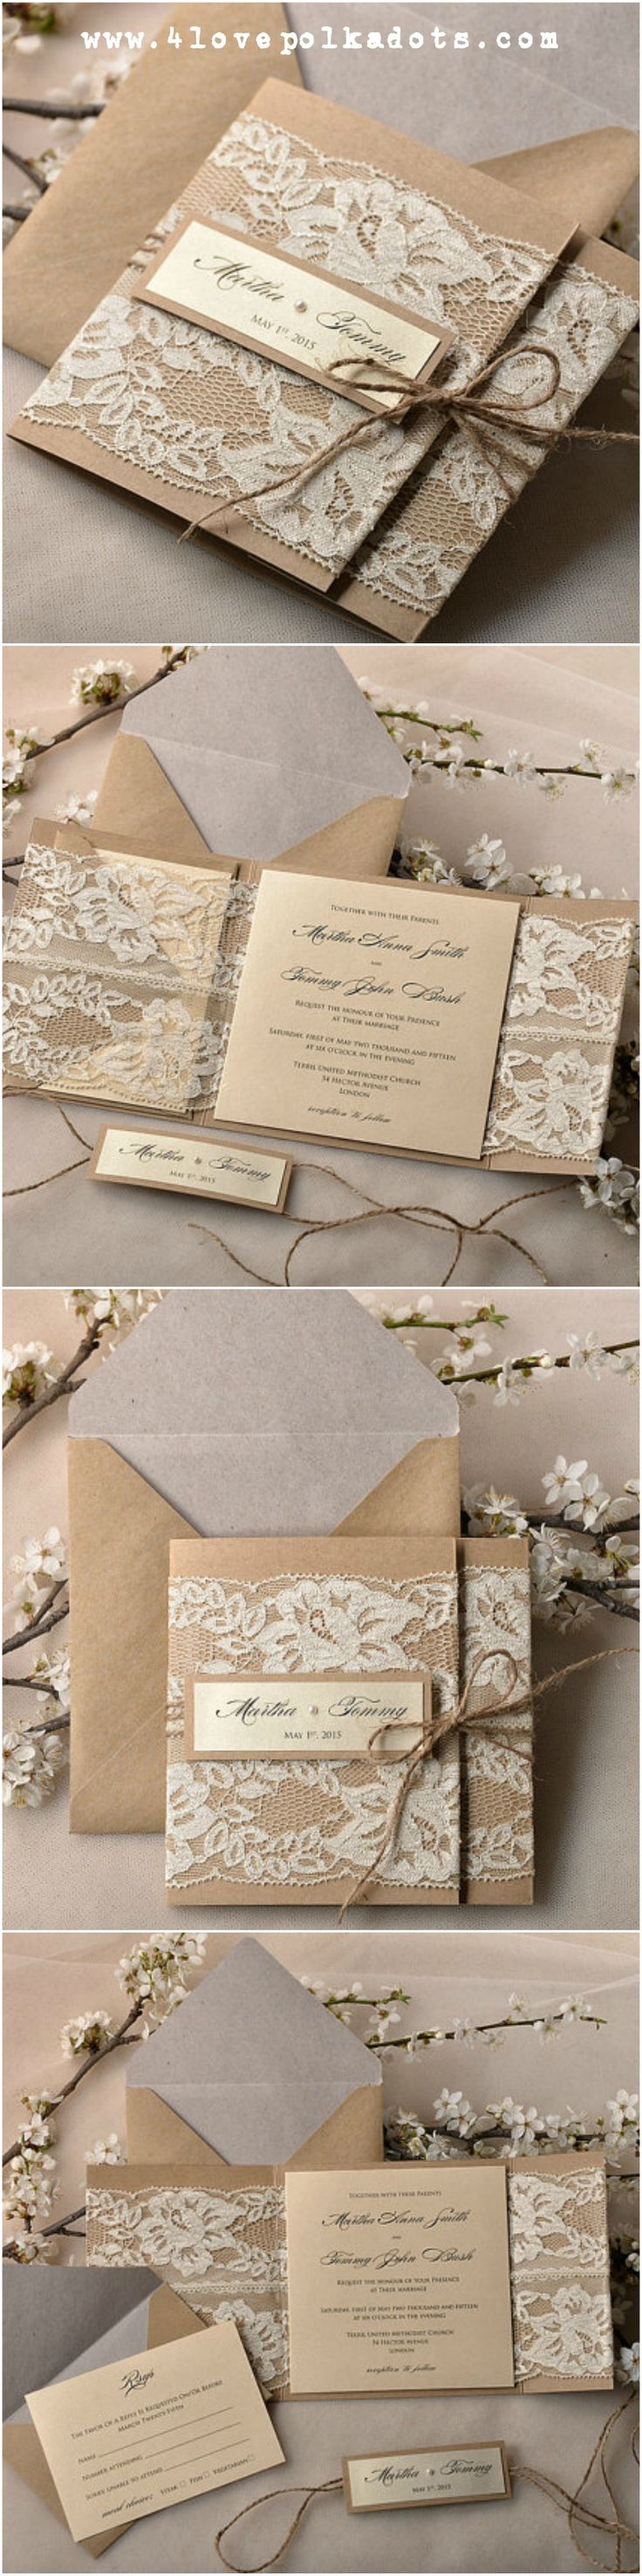 Wedding invitation with lace #4lovepoladots #weddinginvitations #weddingpaper #rusticwedding #vintagewedding #invitation